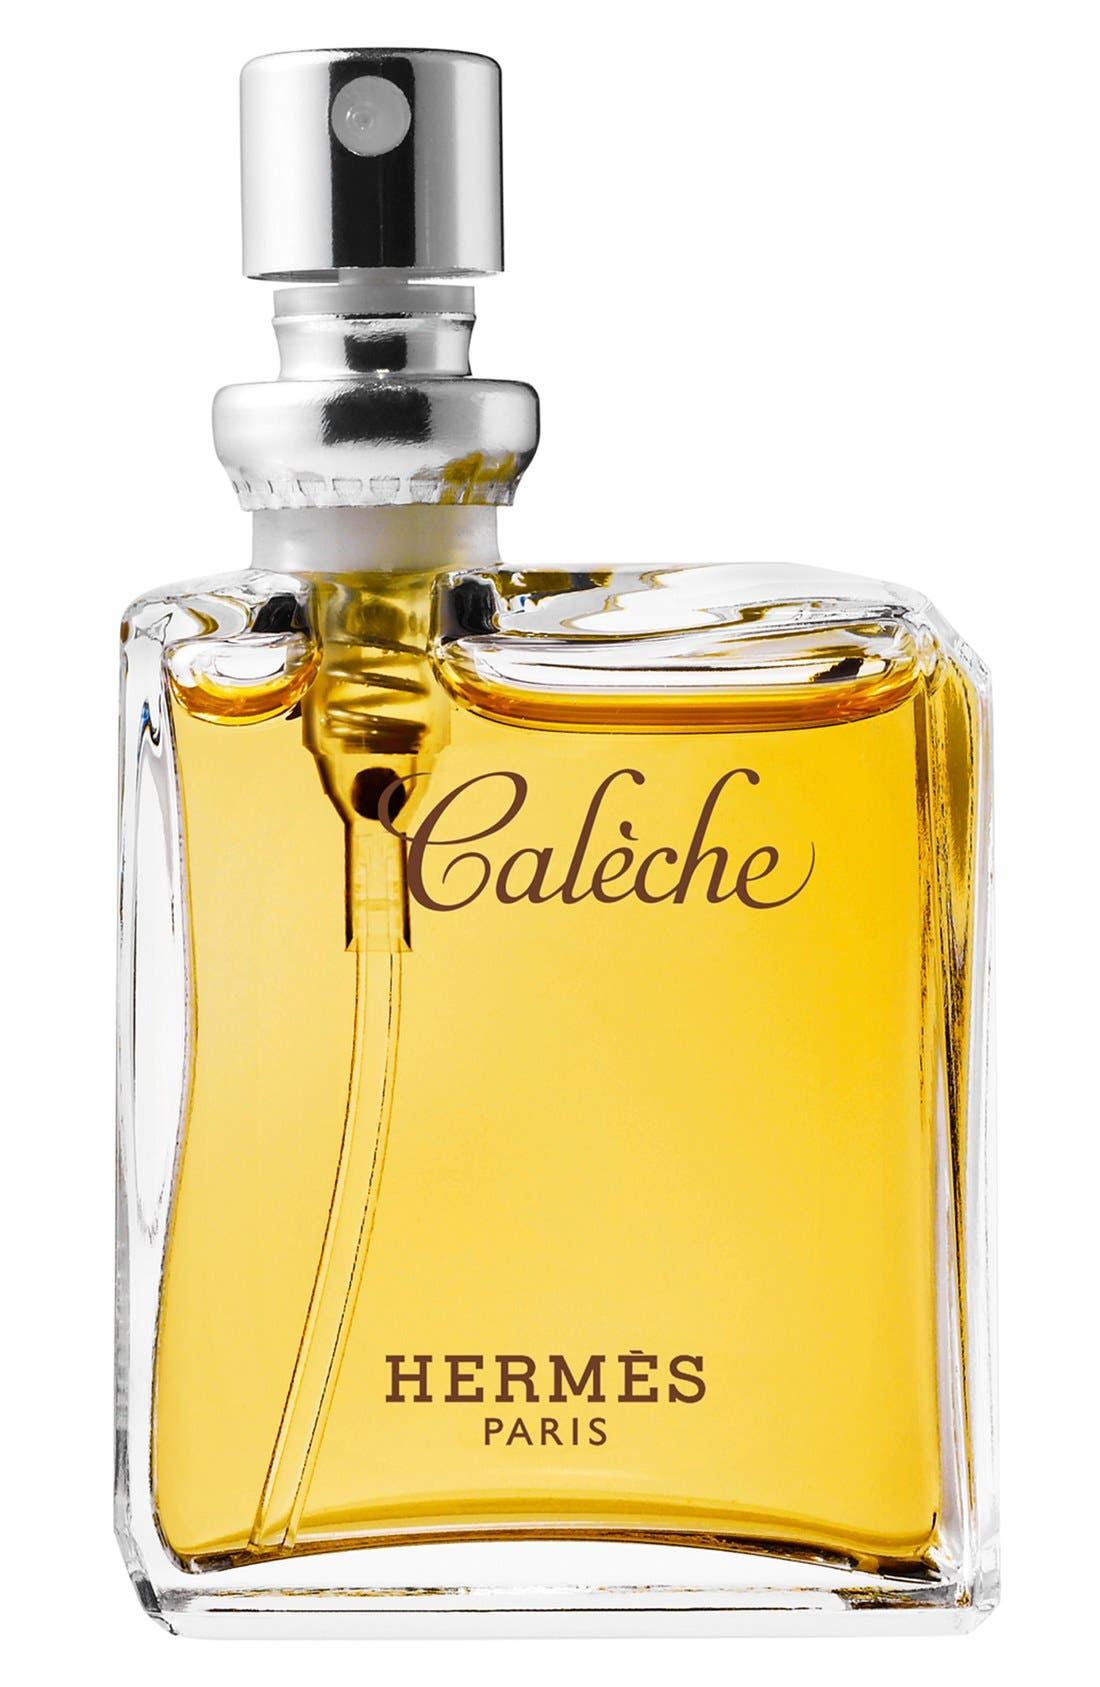 Hermès Calèche - Pure perfume lock spray refill